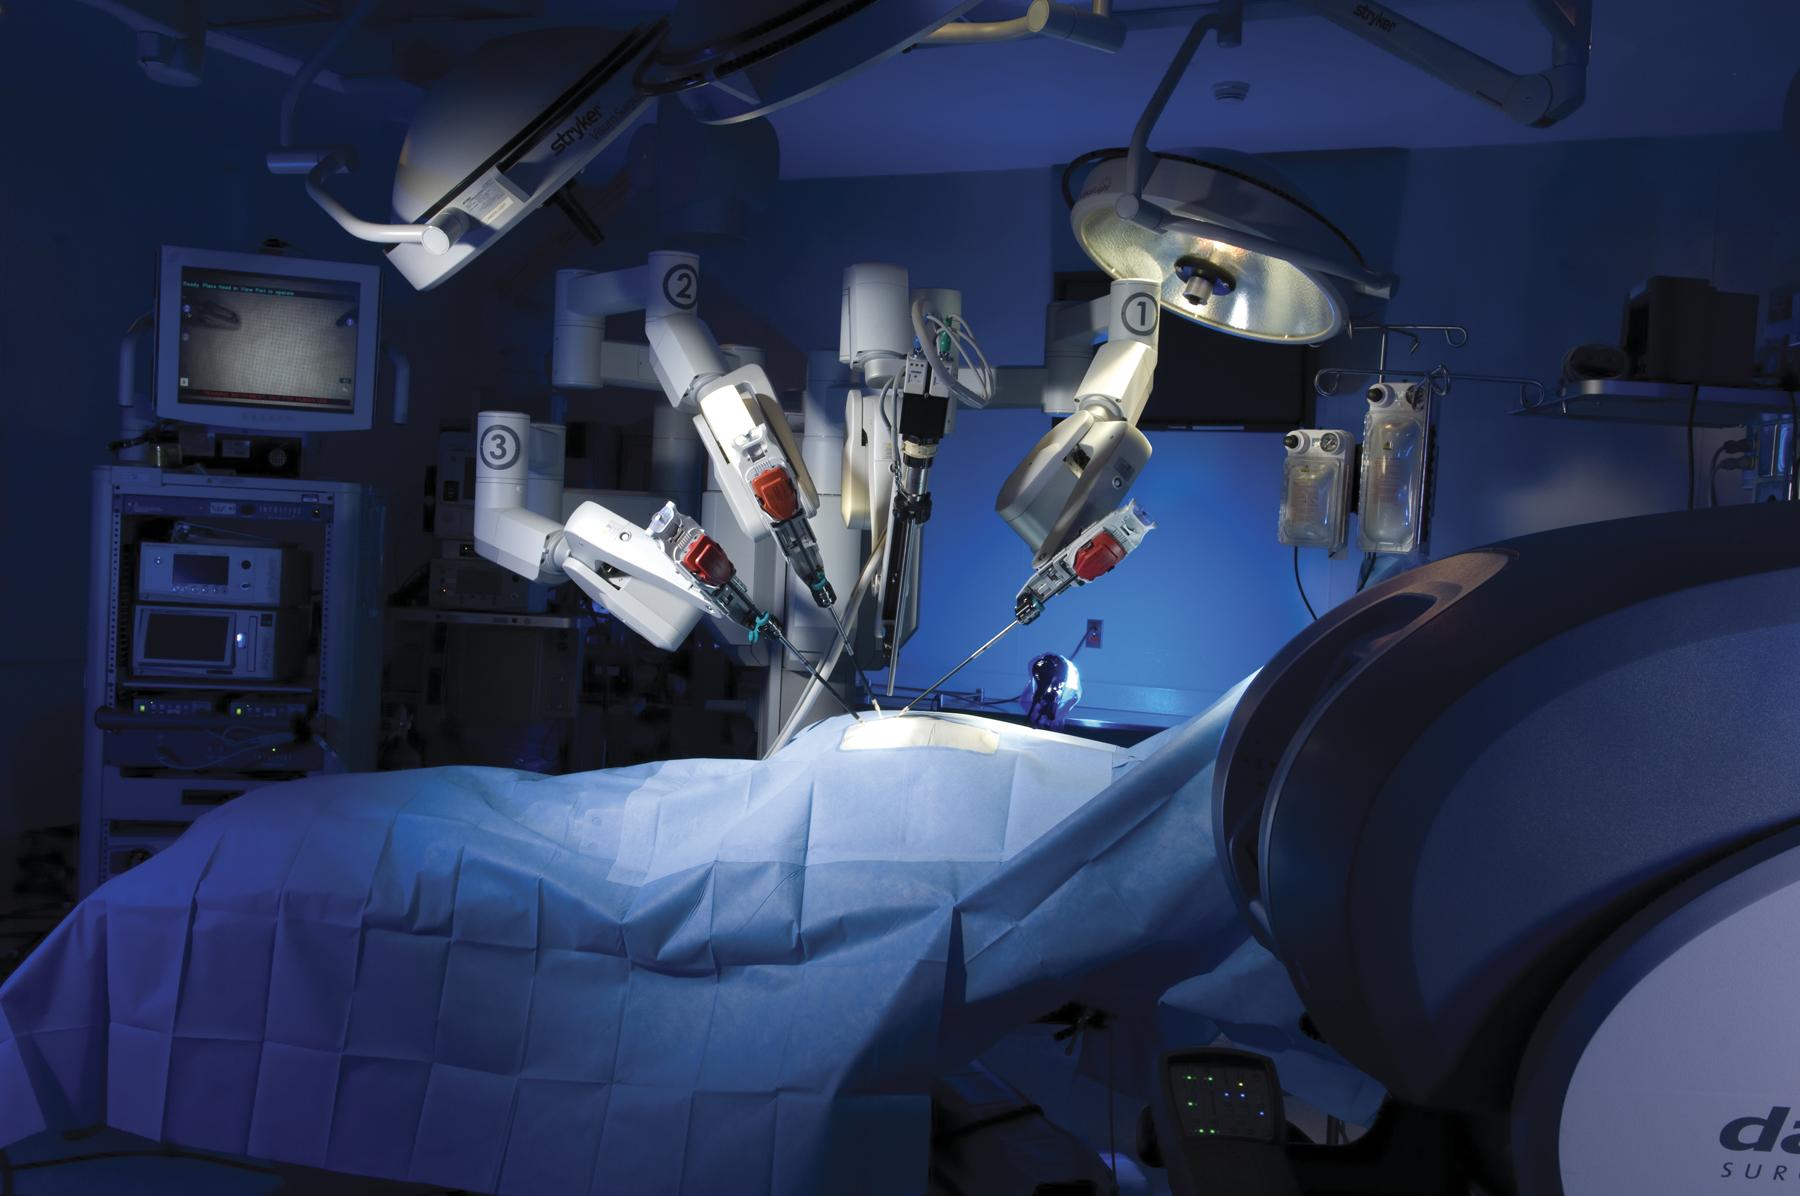 Photo credit: urology.osu.edu